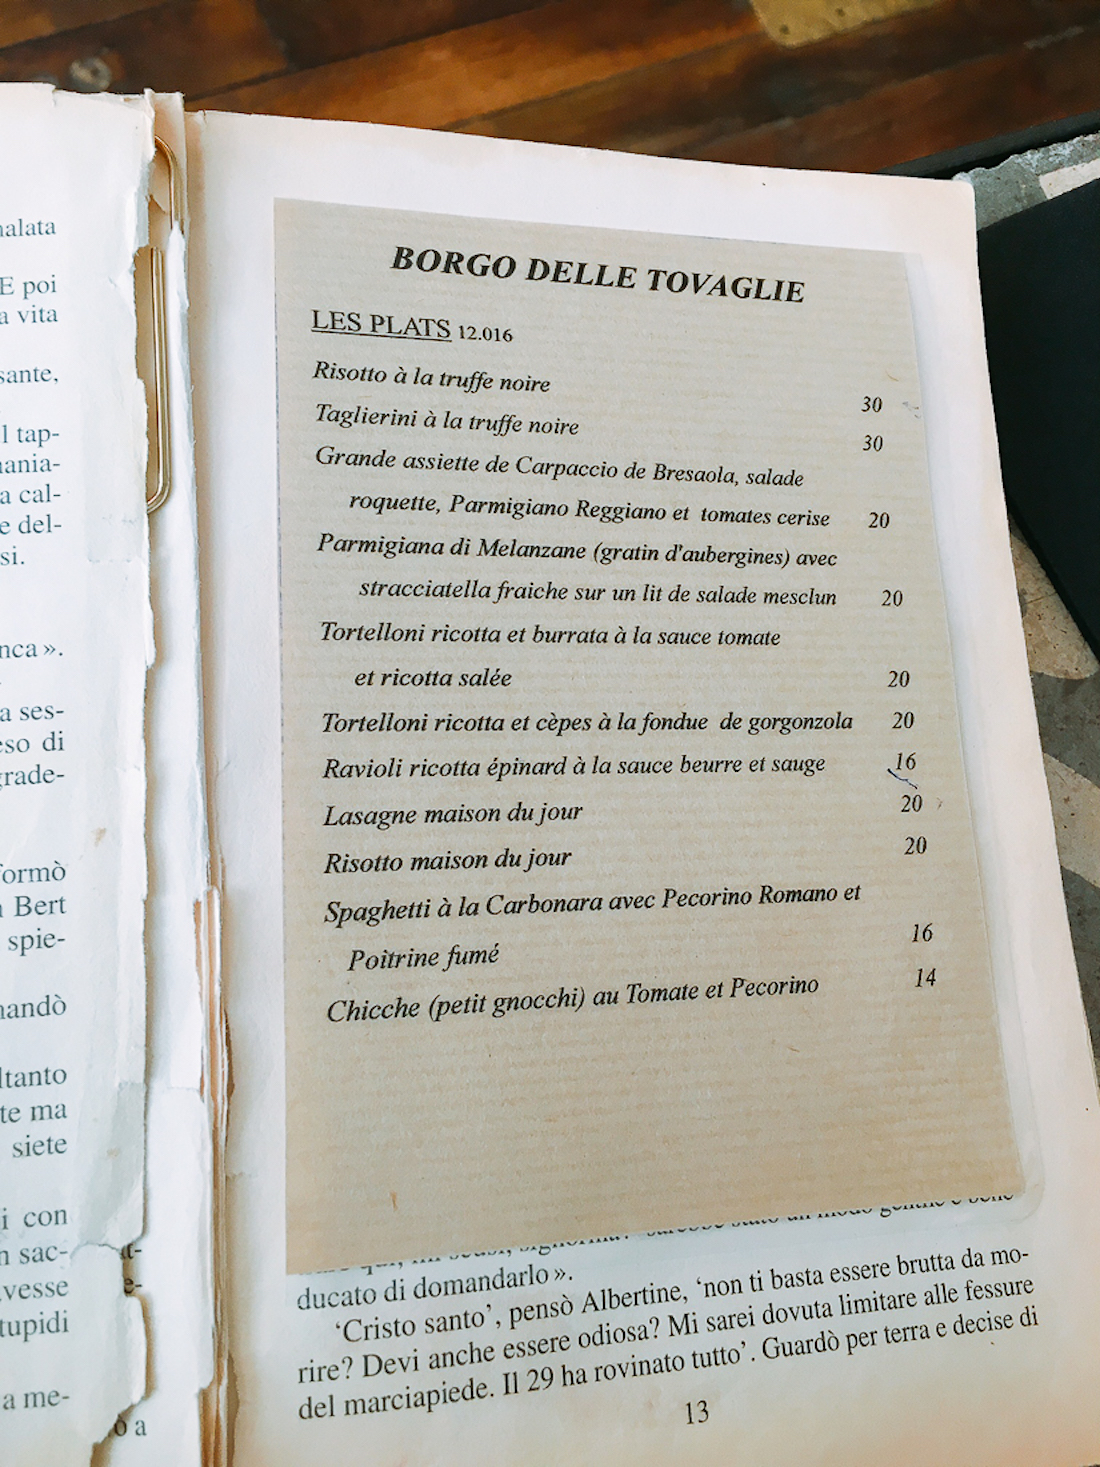 menu-Borgo-delle-Tovaglie-paris11